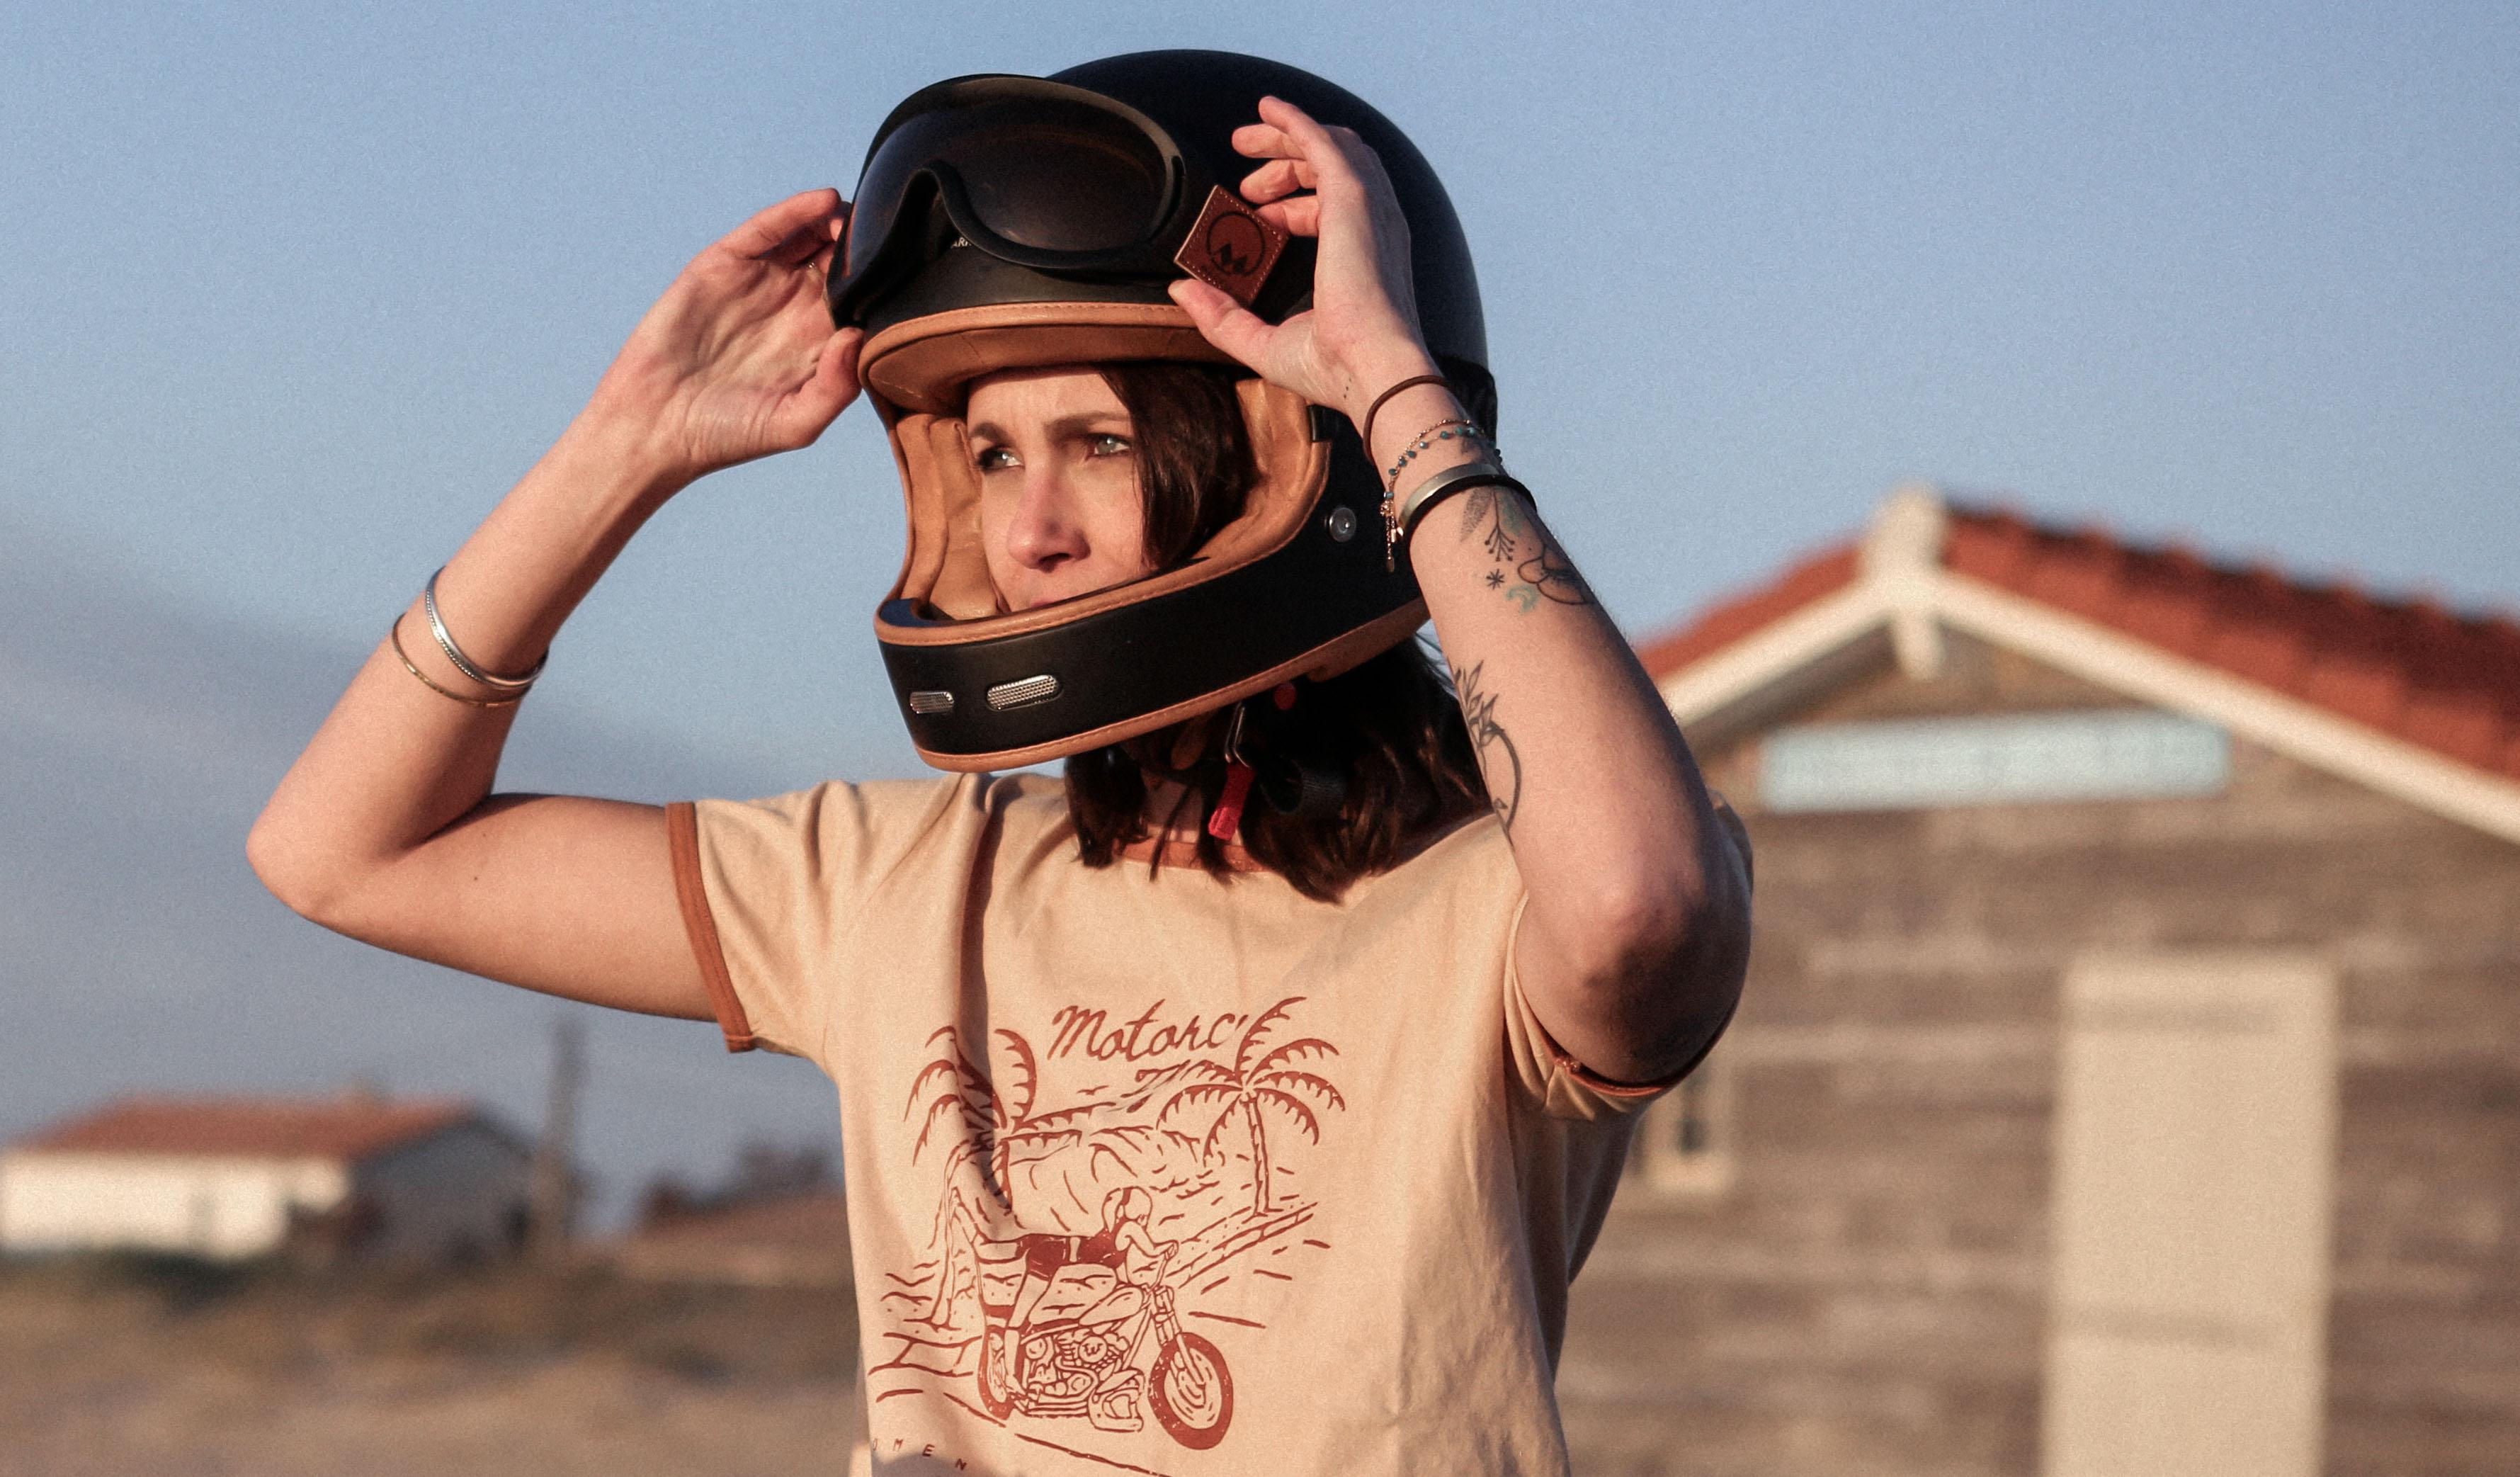 moto therapy shirt